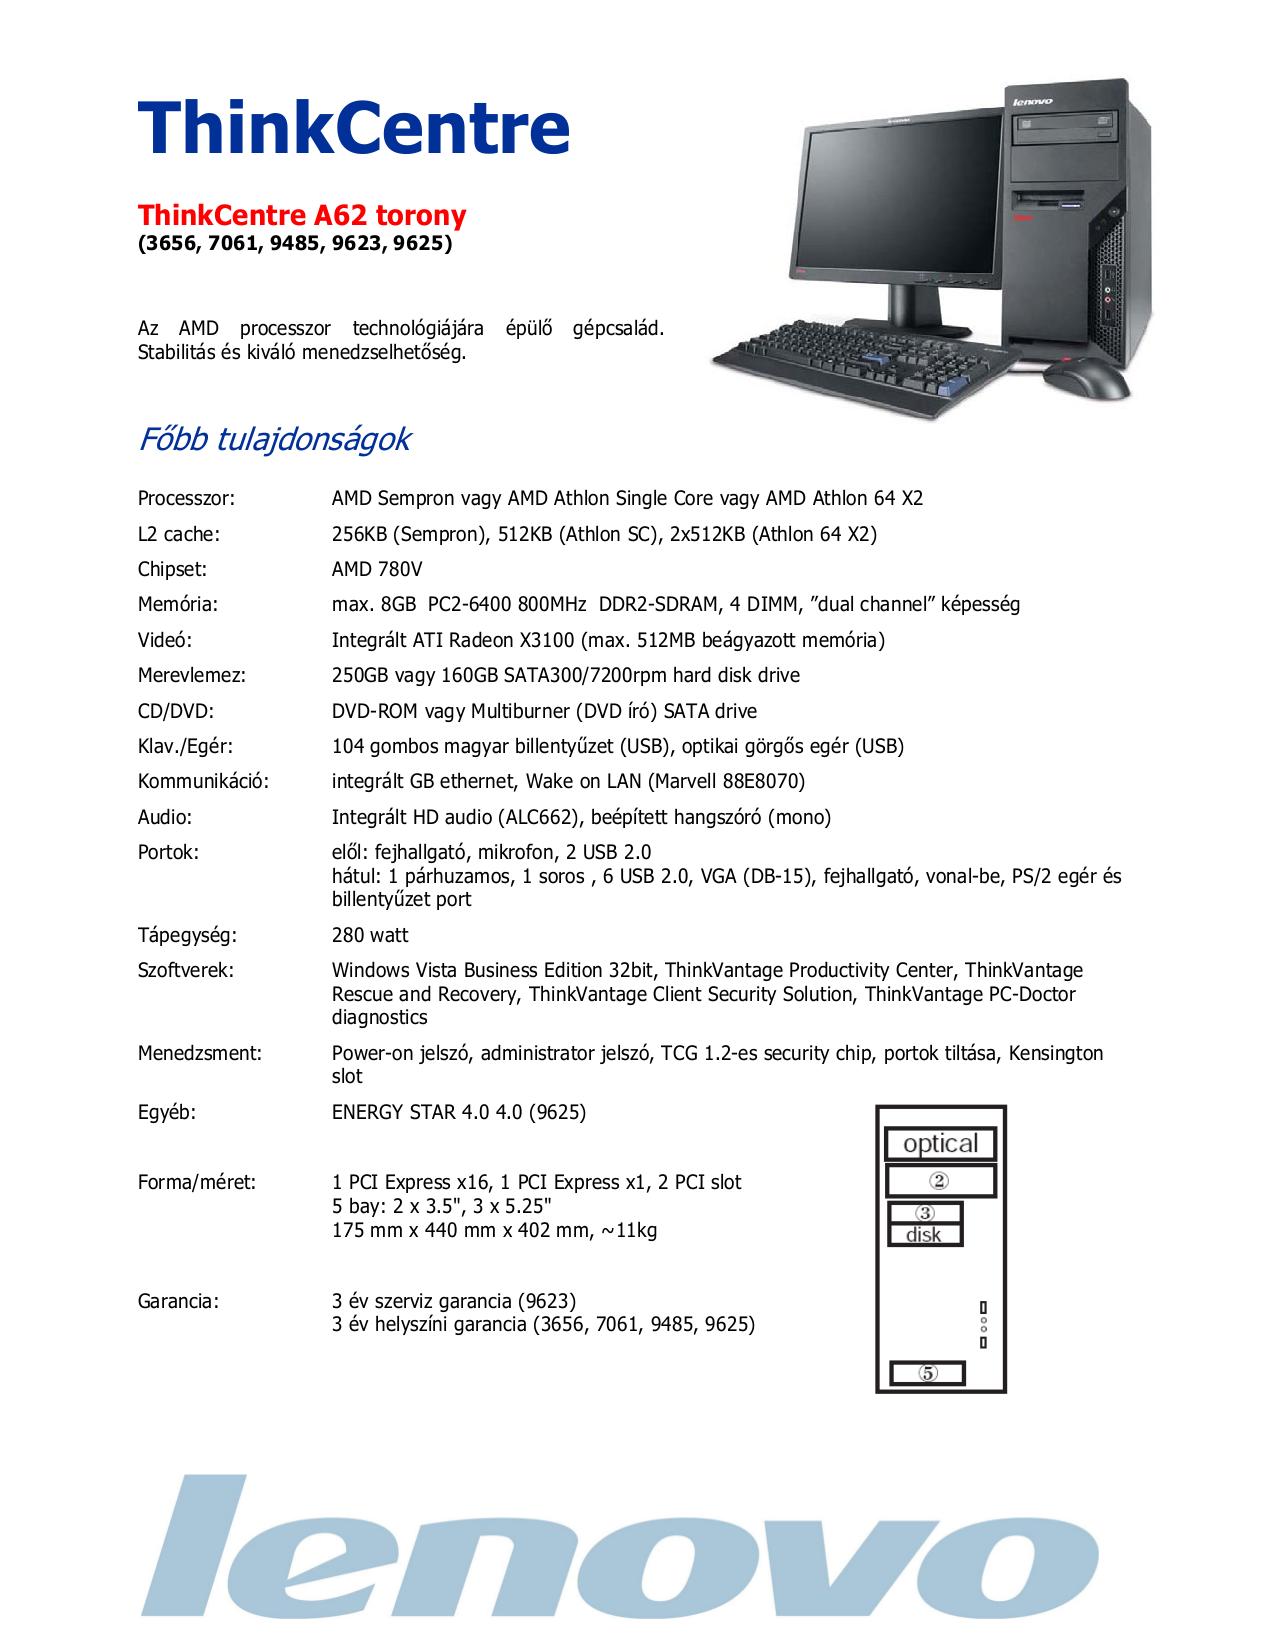 pdf for Lenovo Desktop ThinkCentre A62 9625 manual